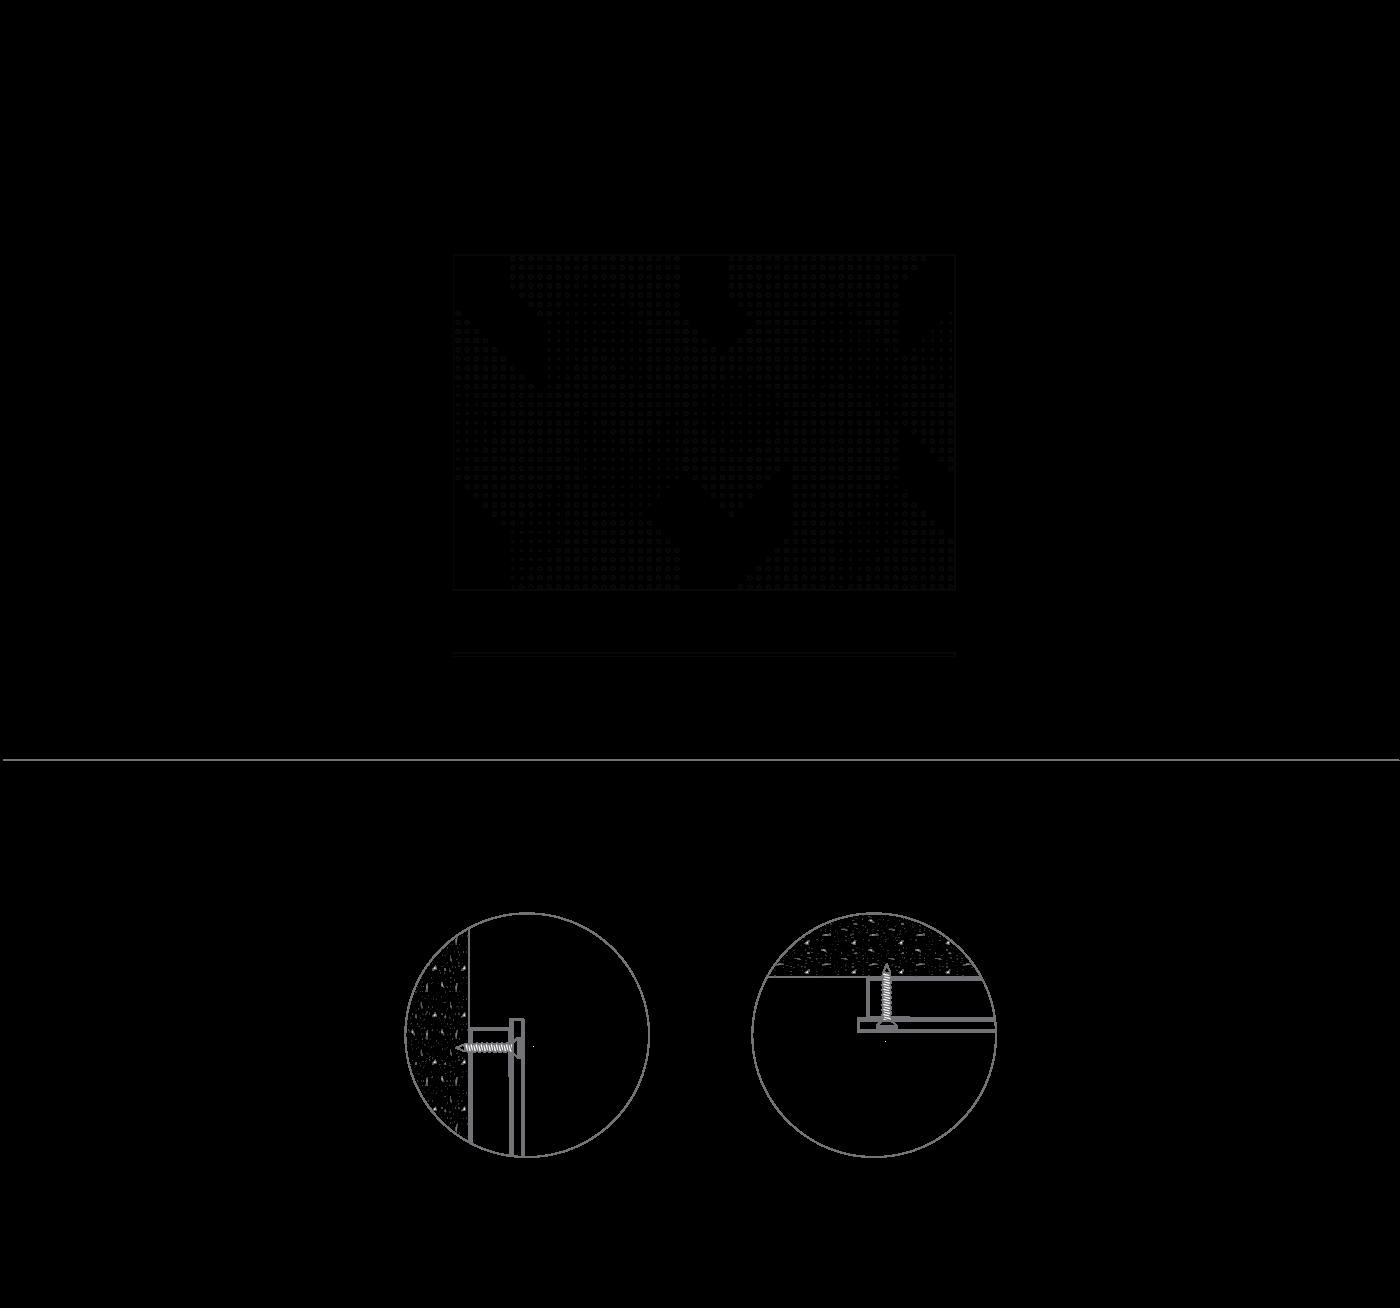 Artnovion product komodo w ae surface c1348cd6a0